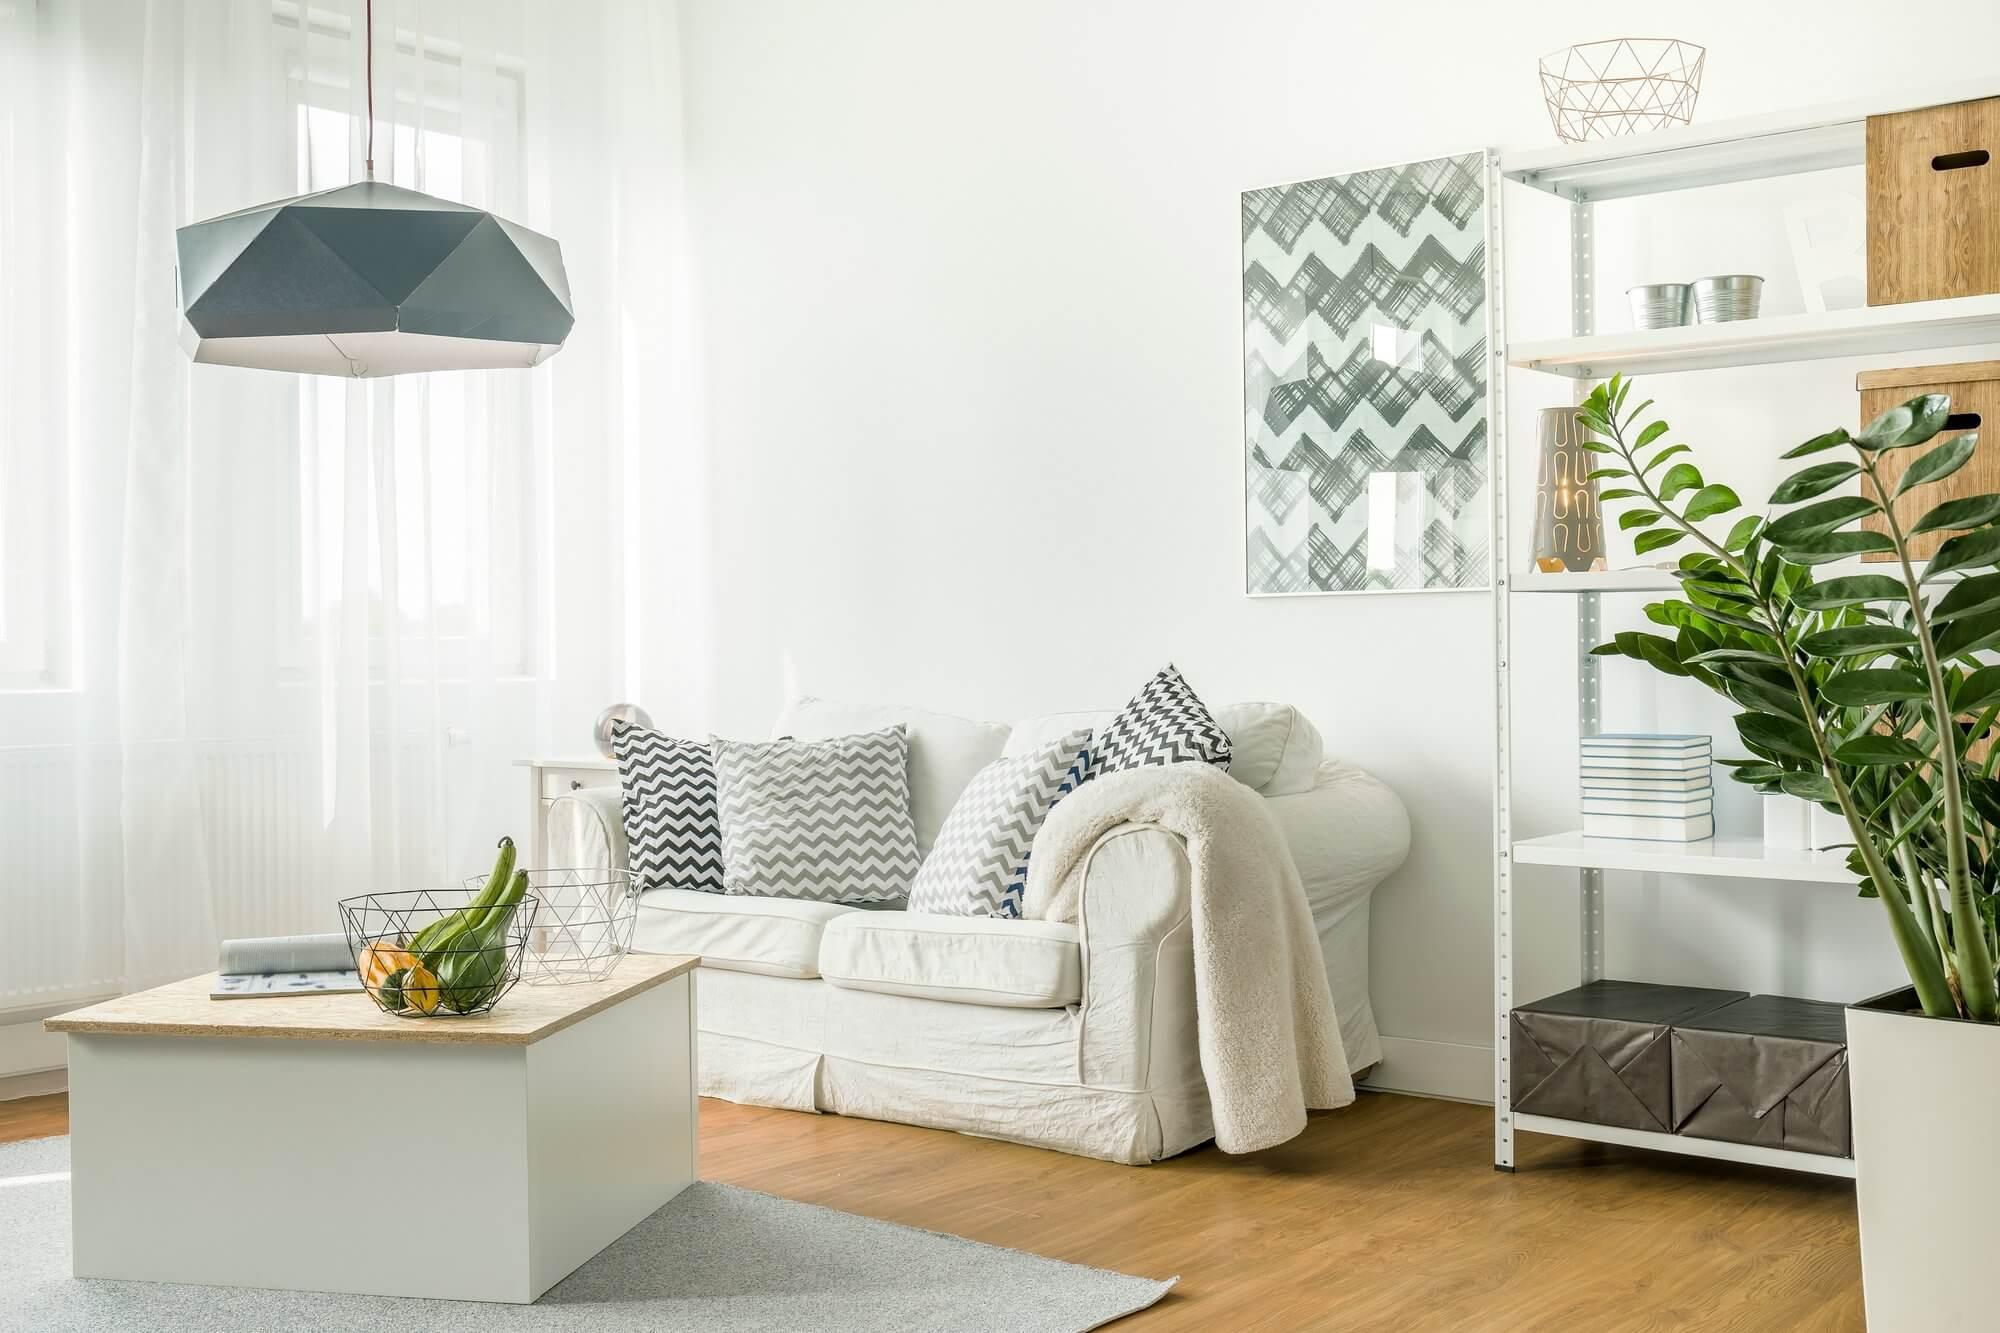 Geometric Light Pendants - Living Room Decor Ideas